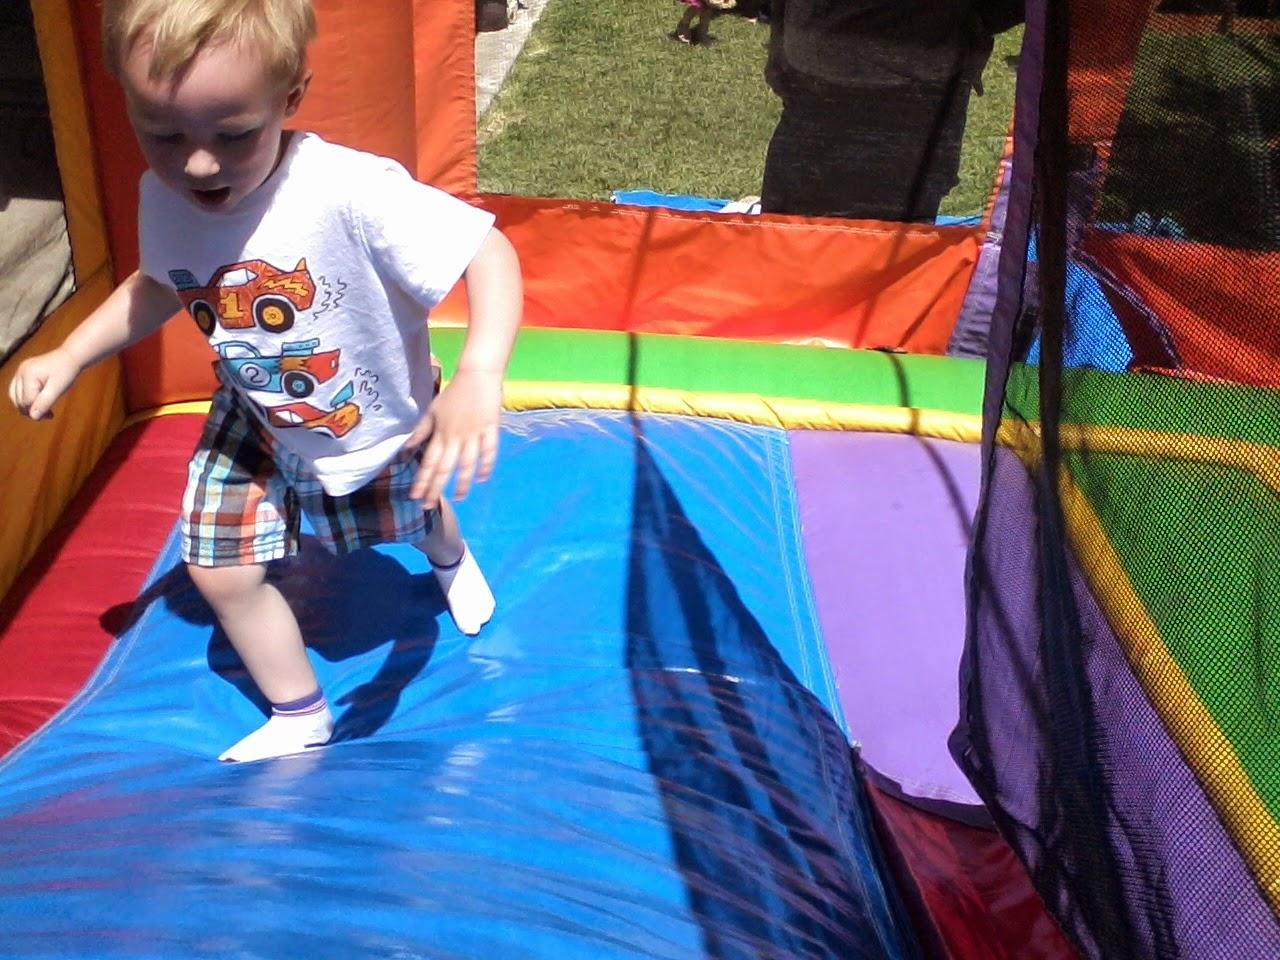 Marshalls Second Birthday Party - 0517113212.jpg